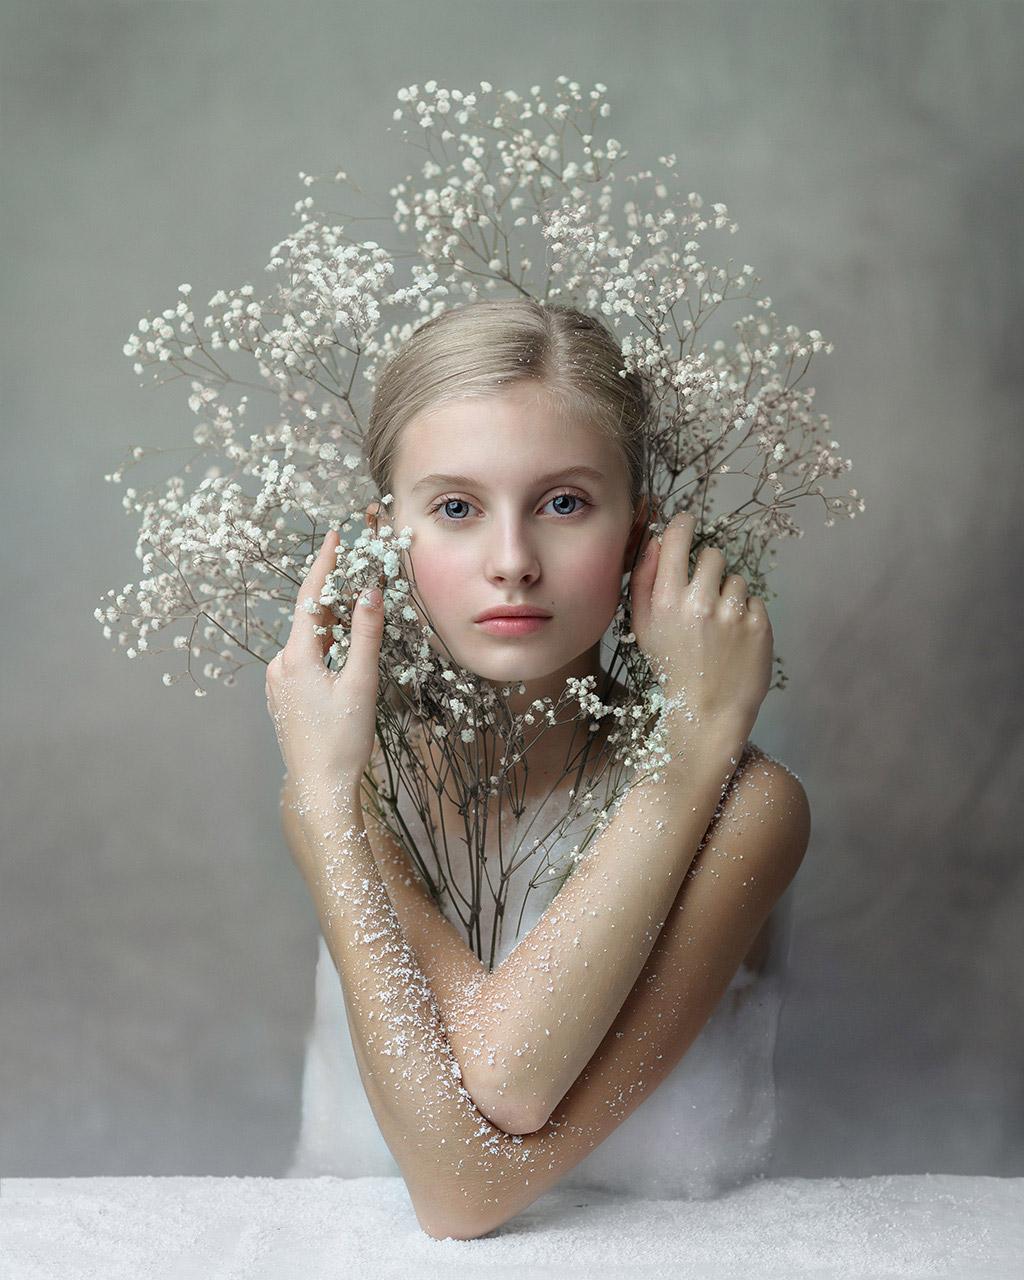 White Queen, © Mariola Glajcar, January 2020 Winner, CPC Portrait Awards